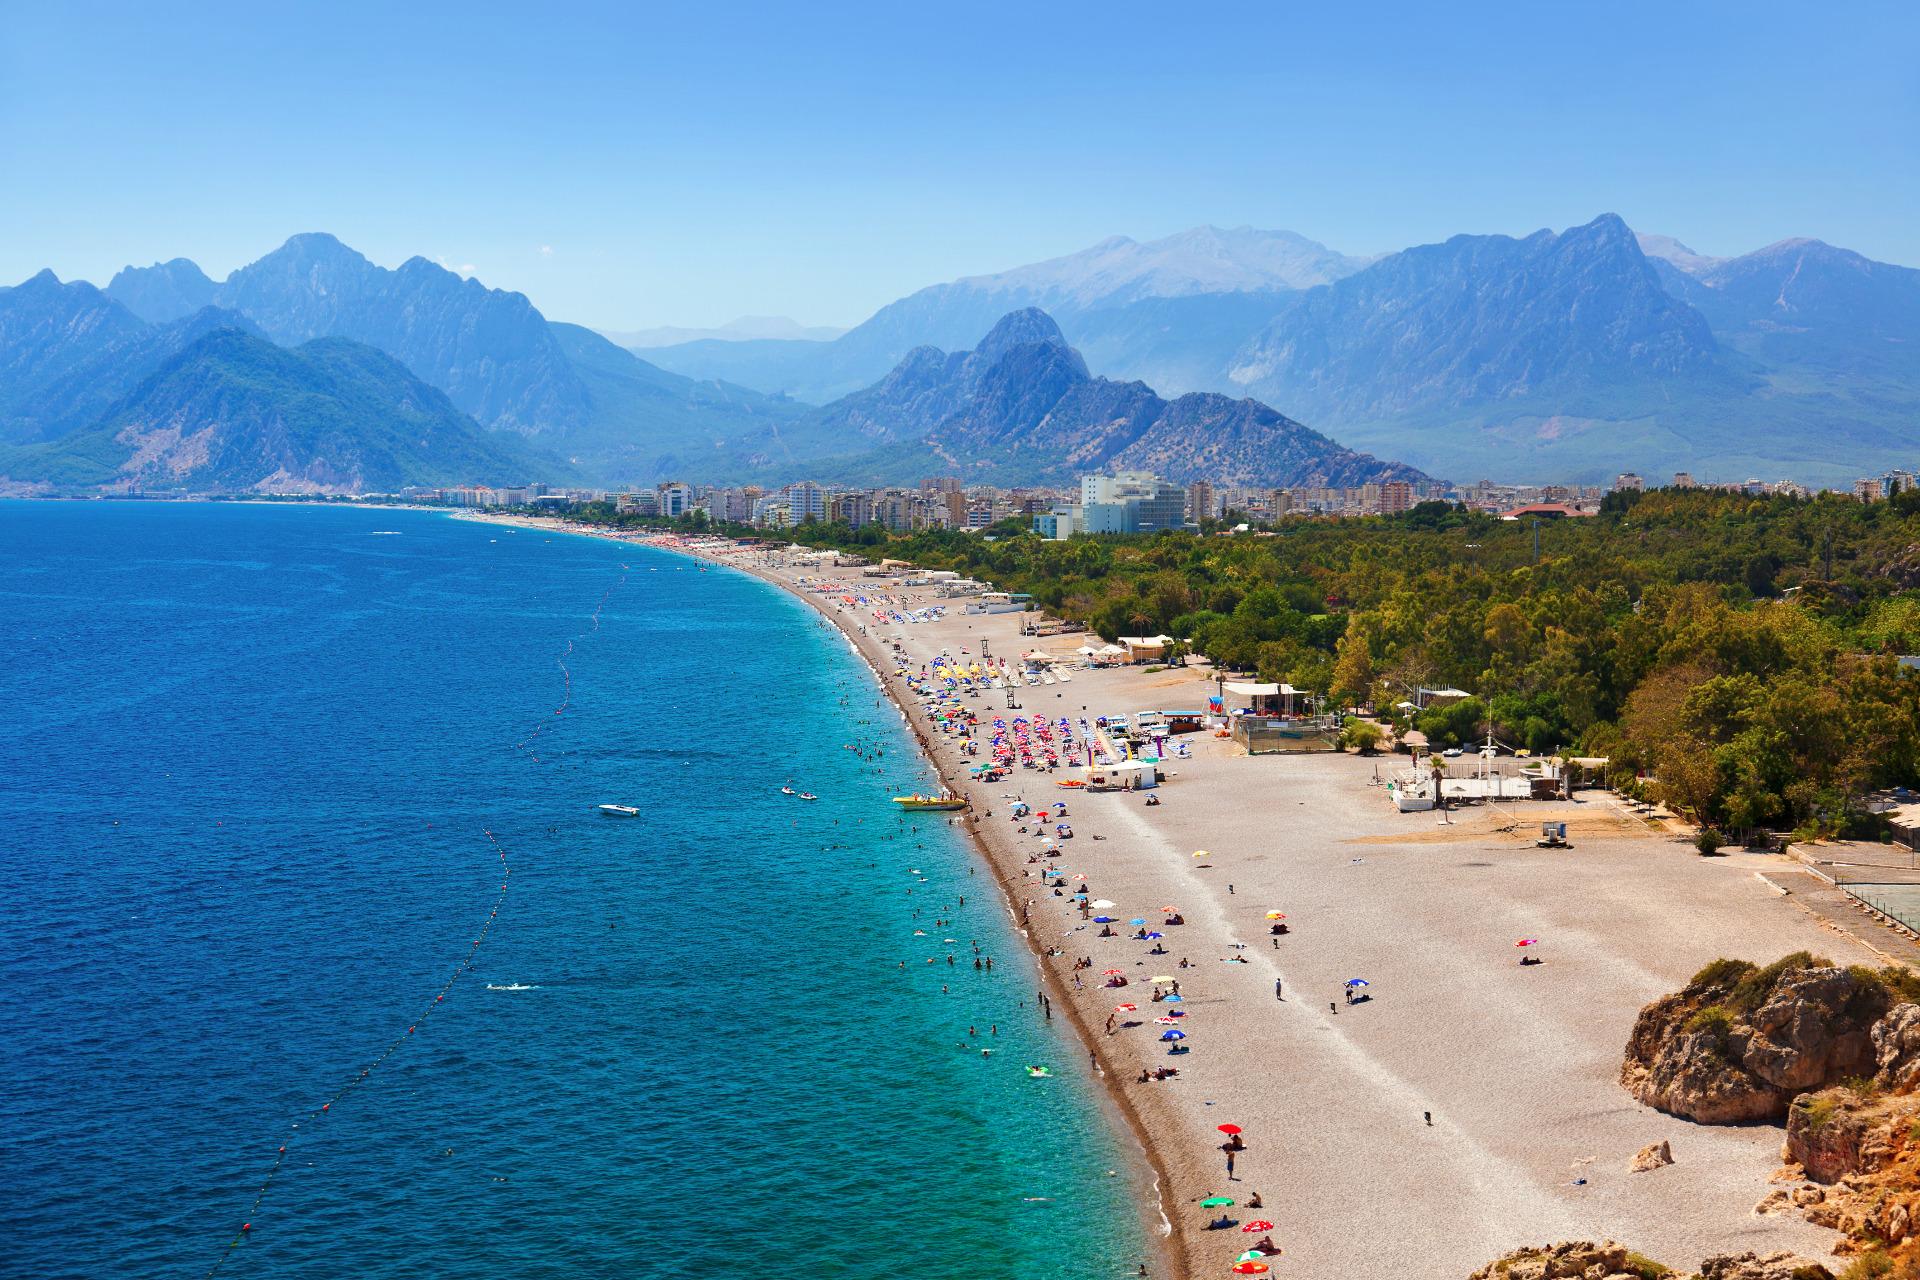 Turkish tourism facilities to get high mobility during Qurban Bayram